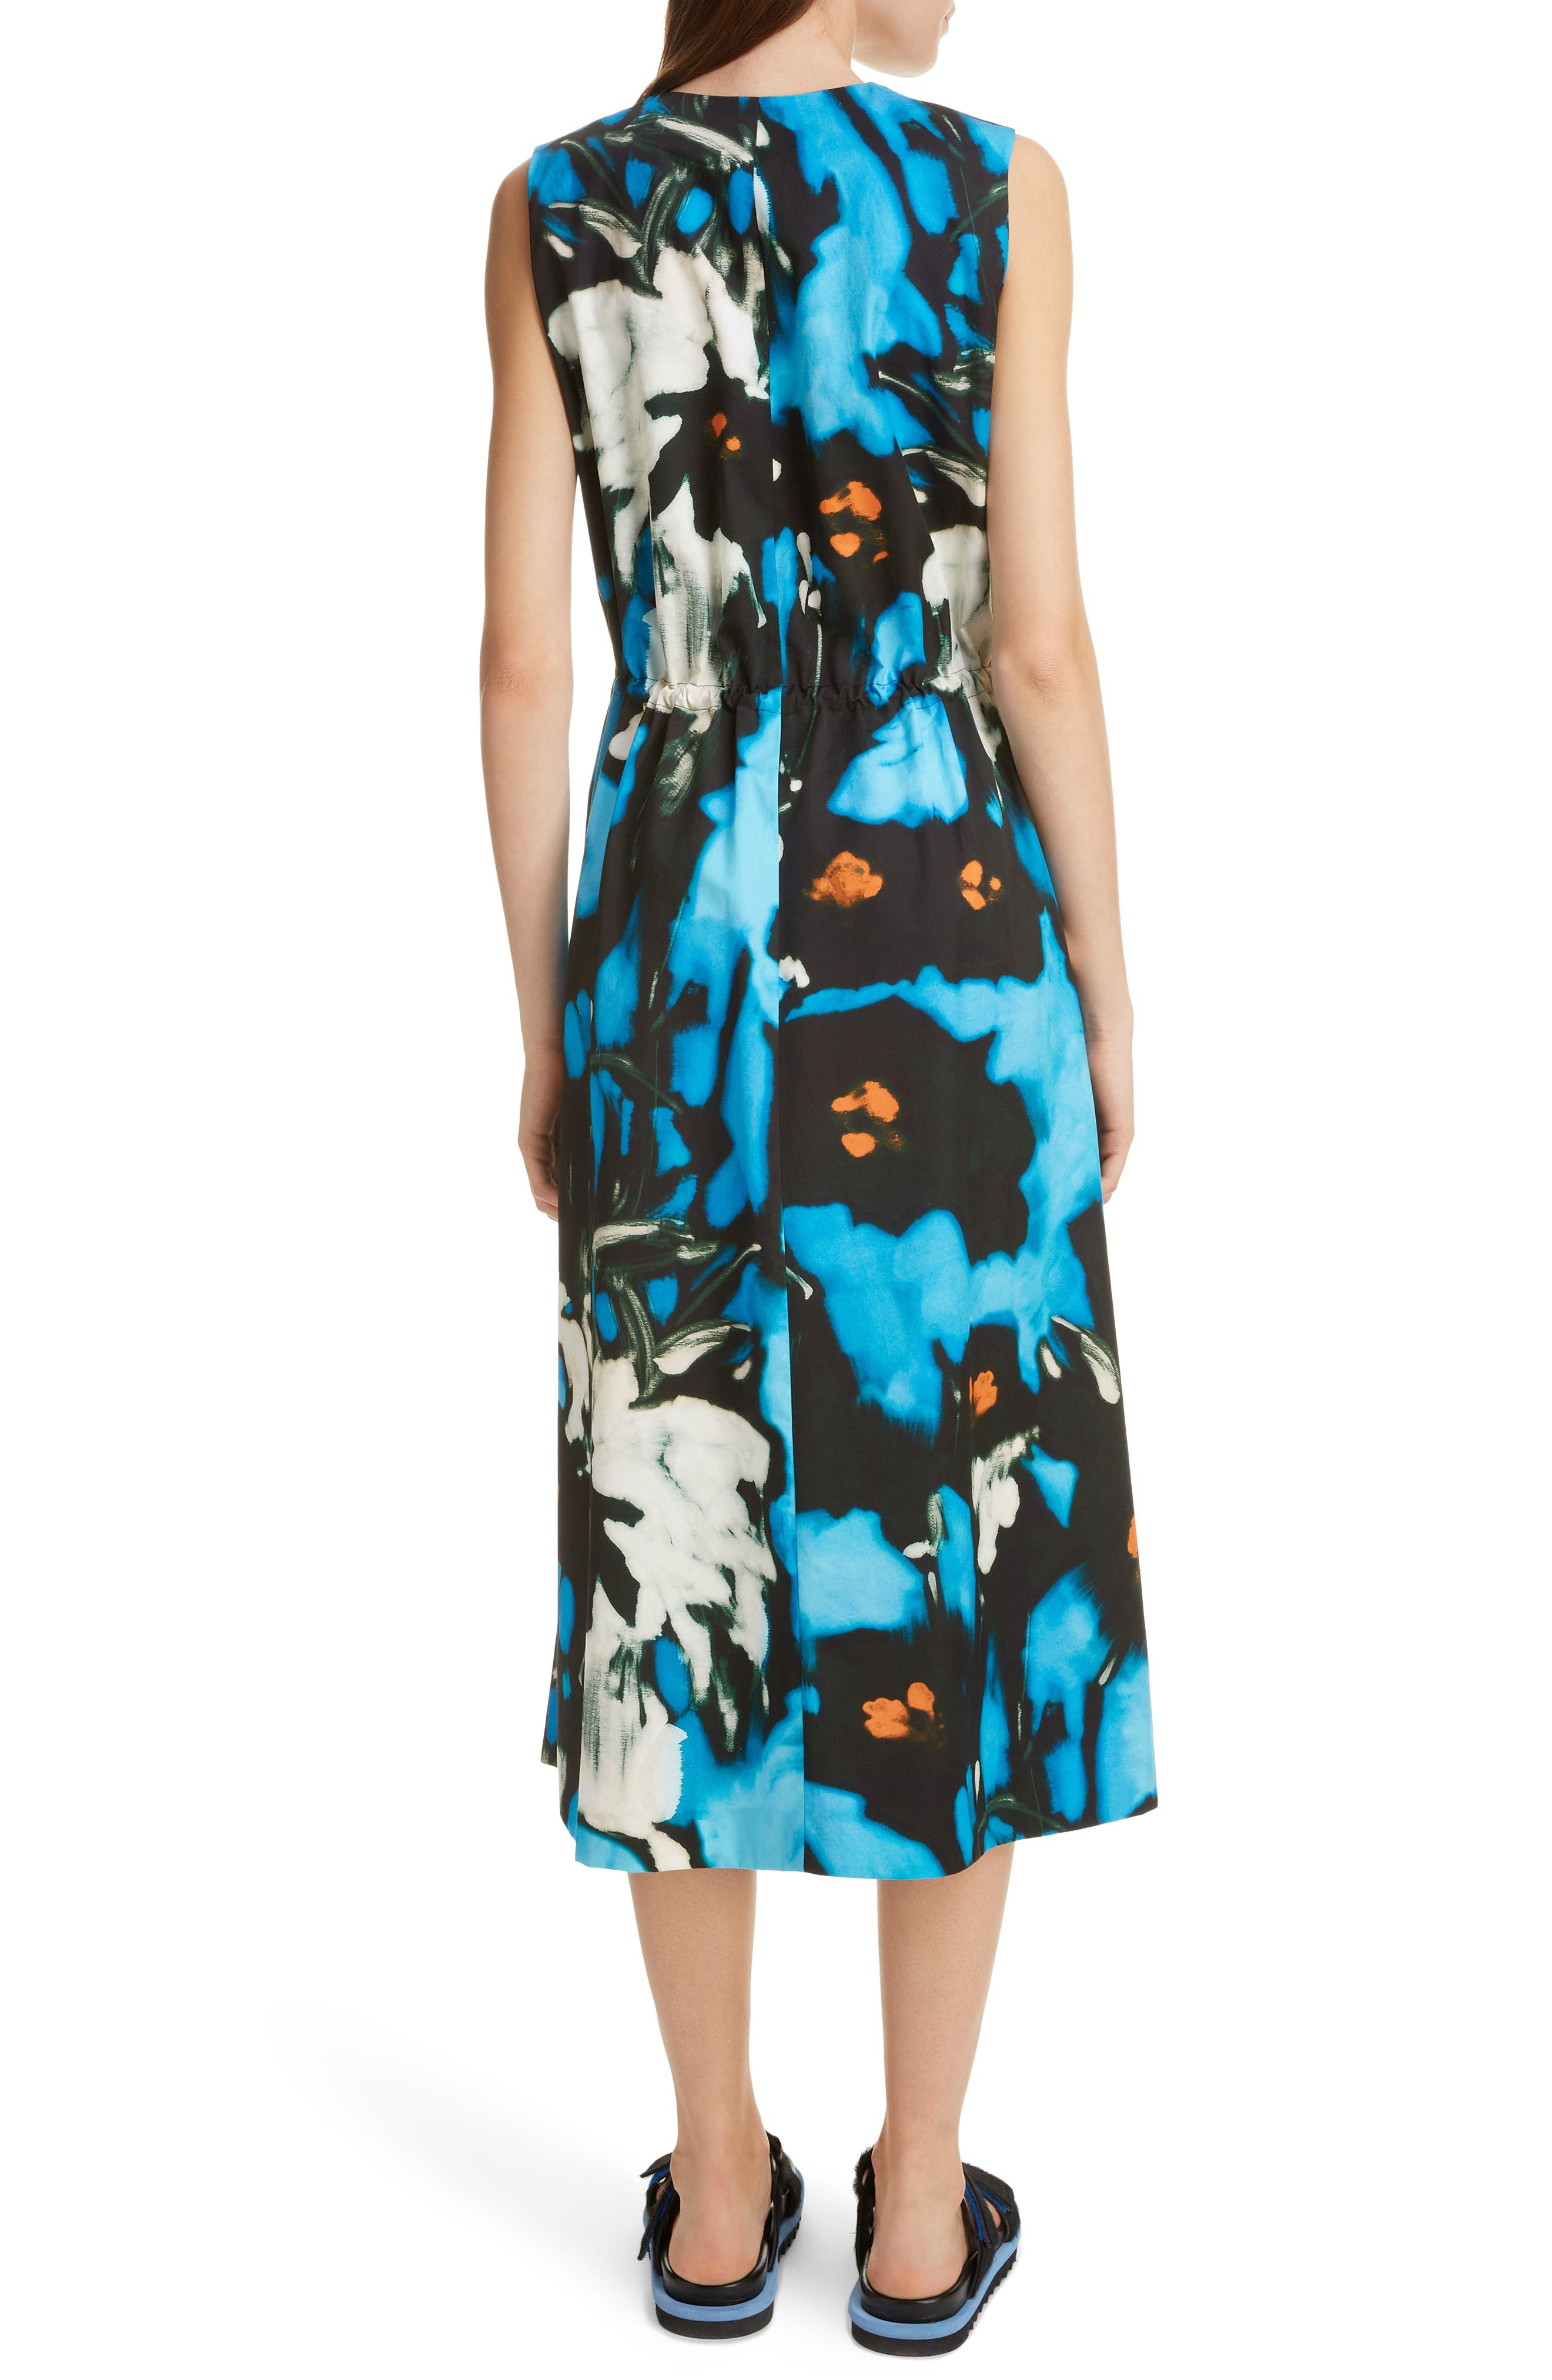 cbf385b50b6a Women s Dries Van Noten Dresses